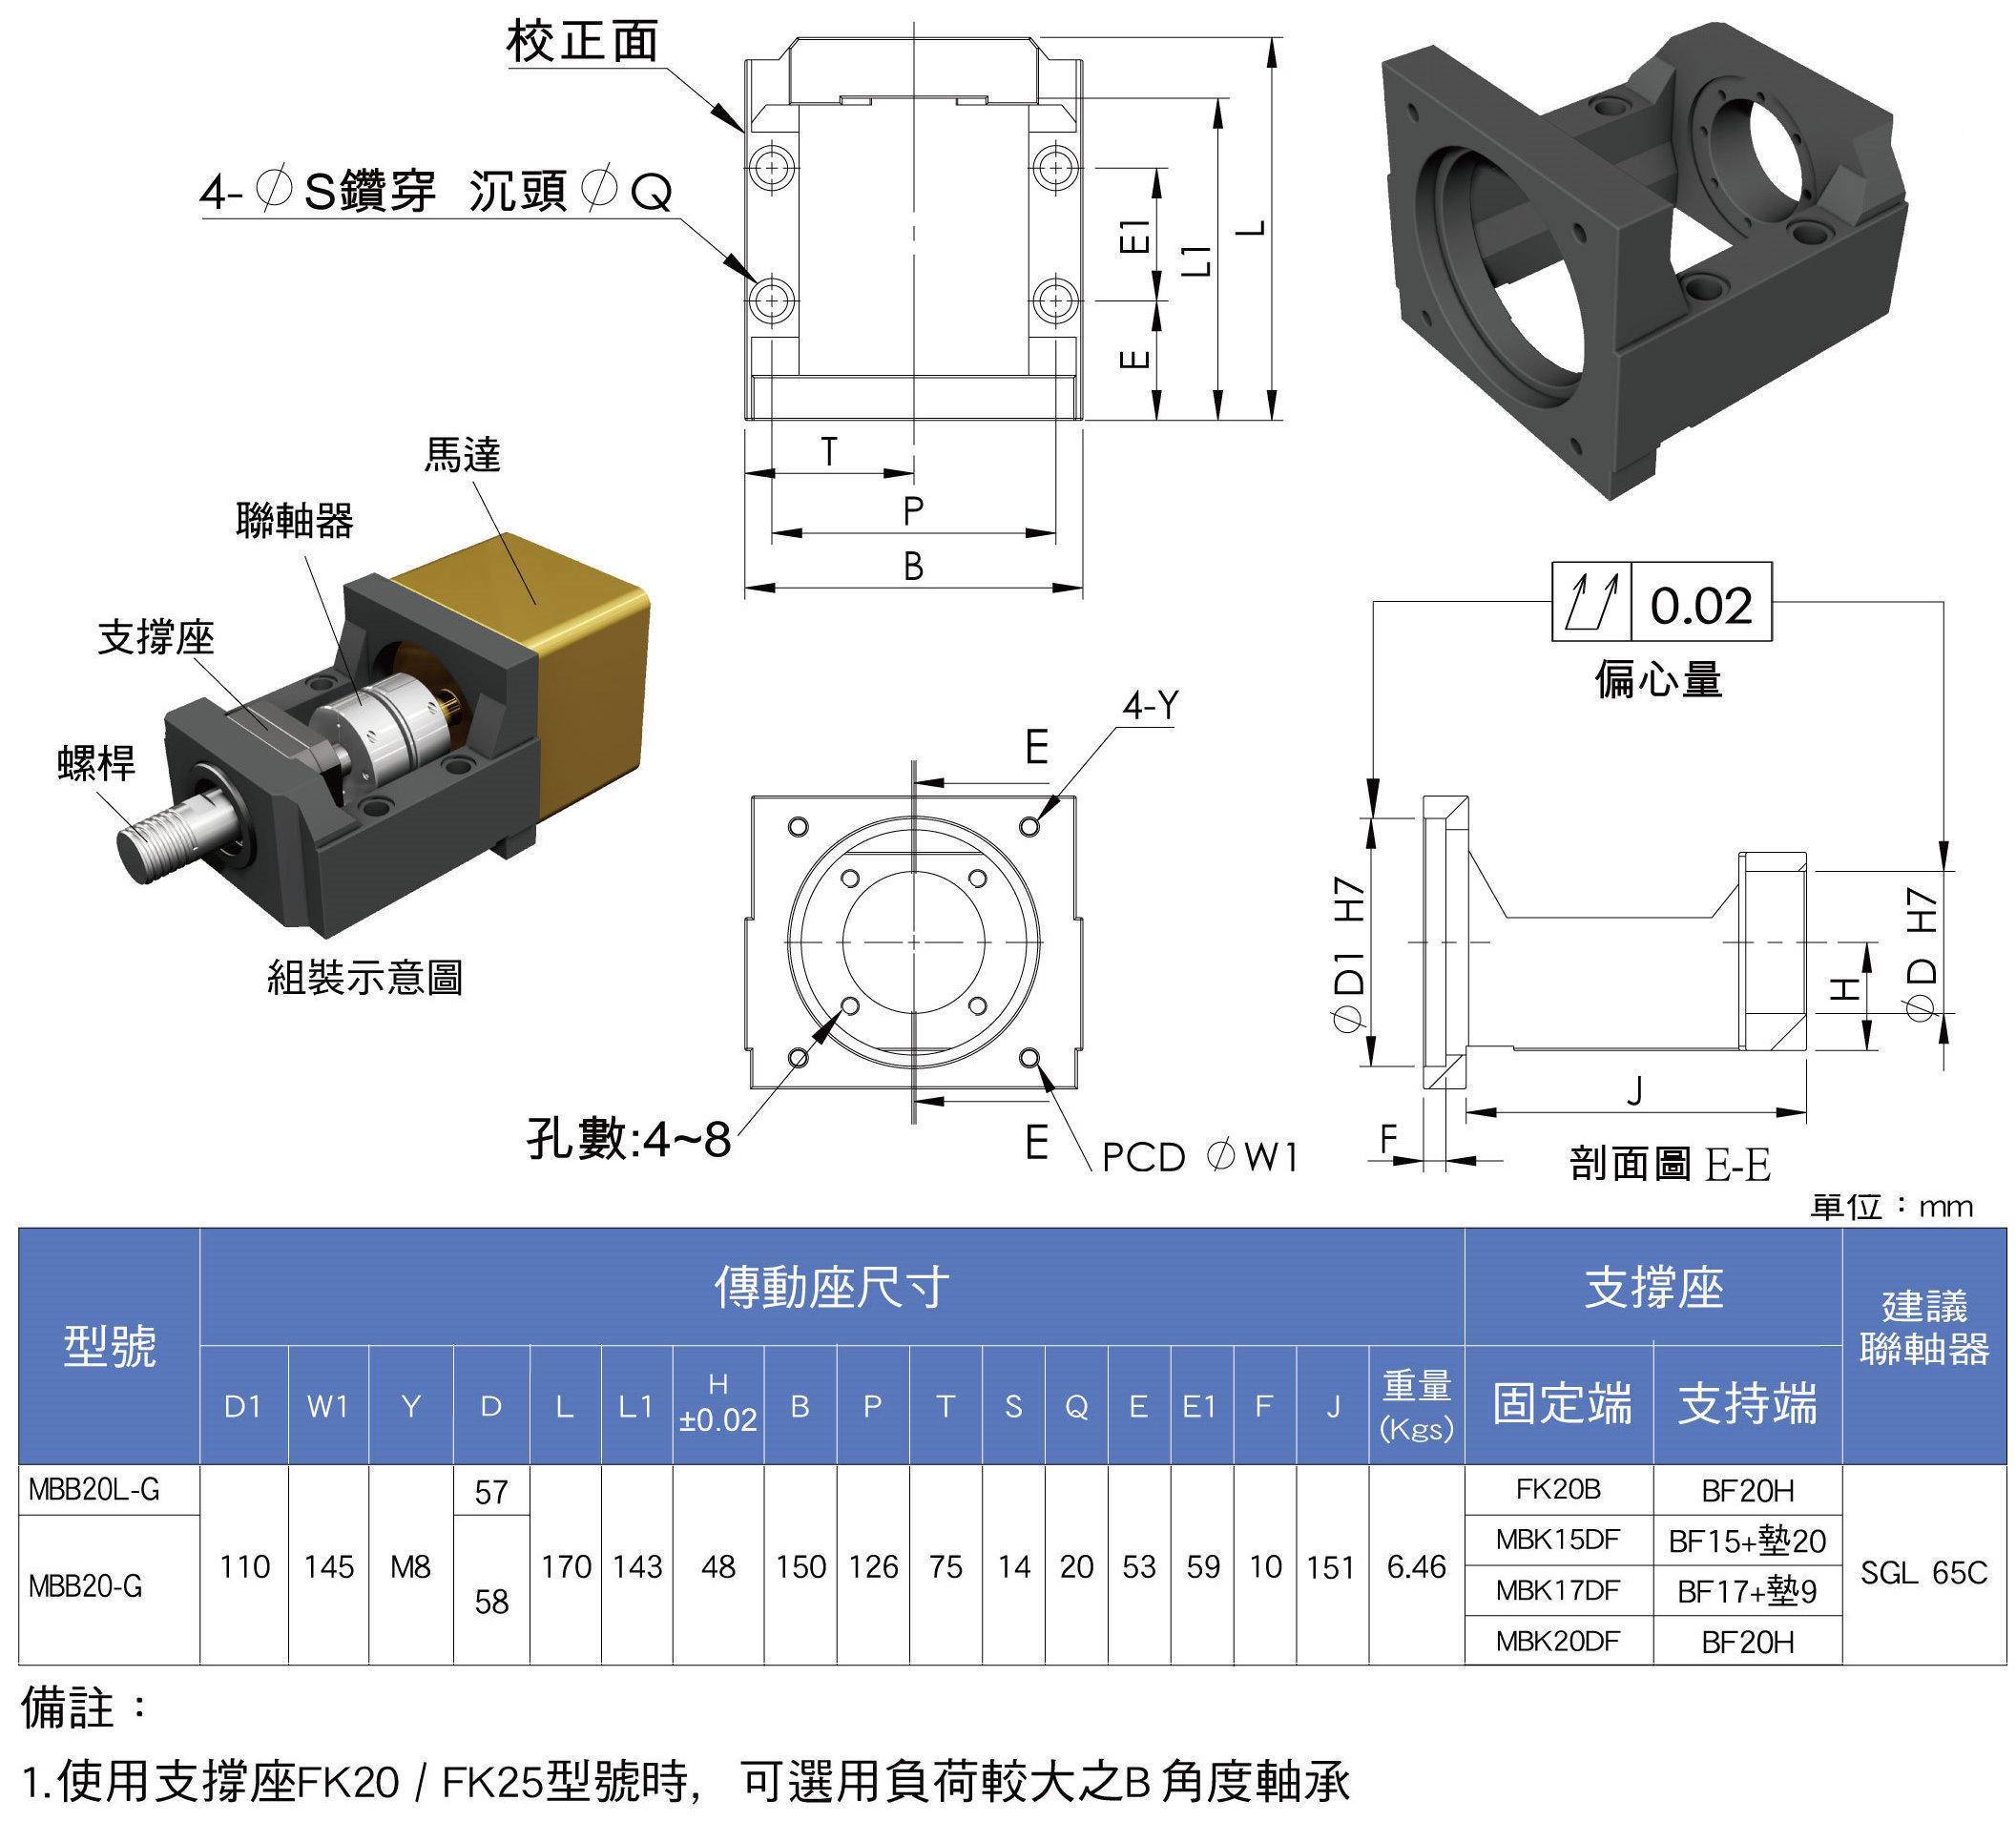 Waida Mfg Co Ltd Mail: SYK-嵩陽工業股份有限公司 SONYUNG Industry Co.,Ltd-Ballscrew Support